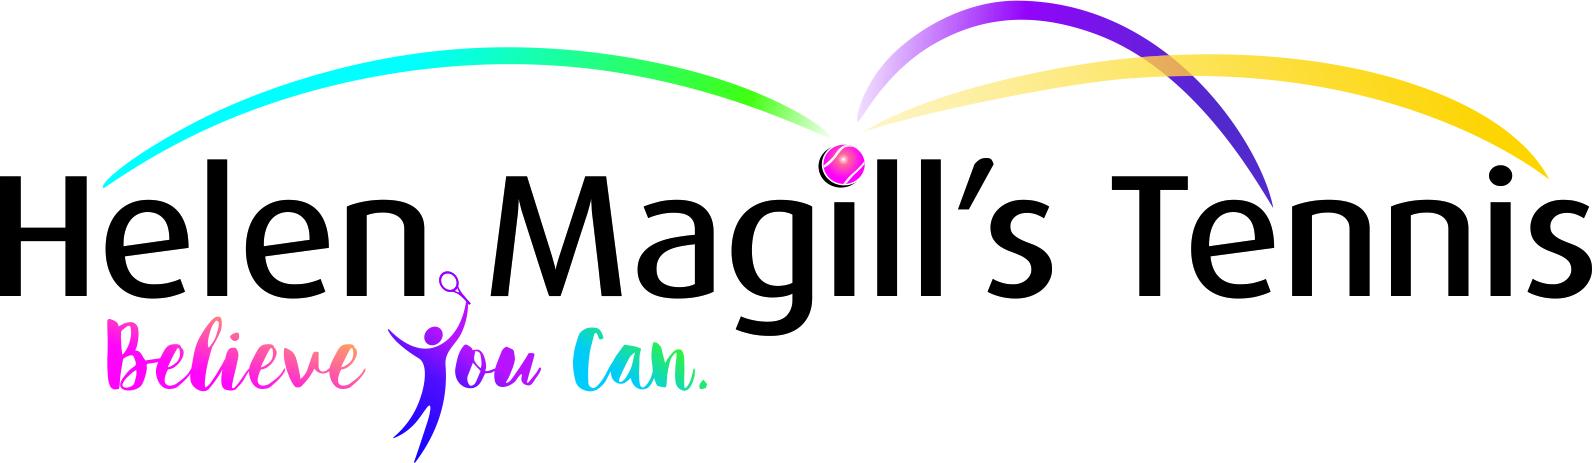 Helen Magill's Tennis - Believe you can